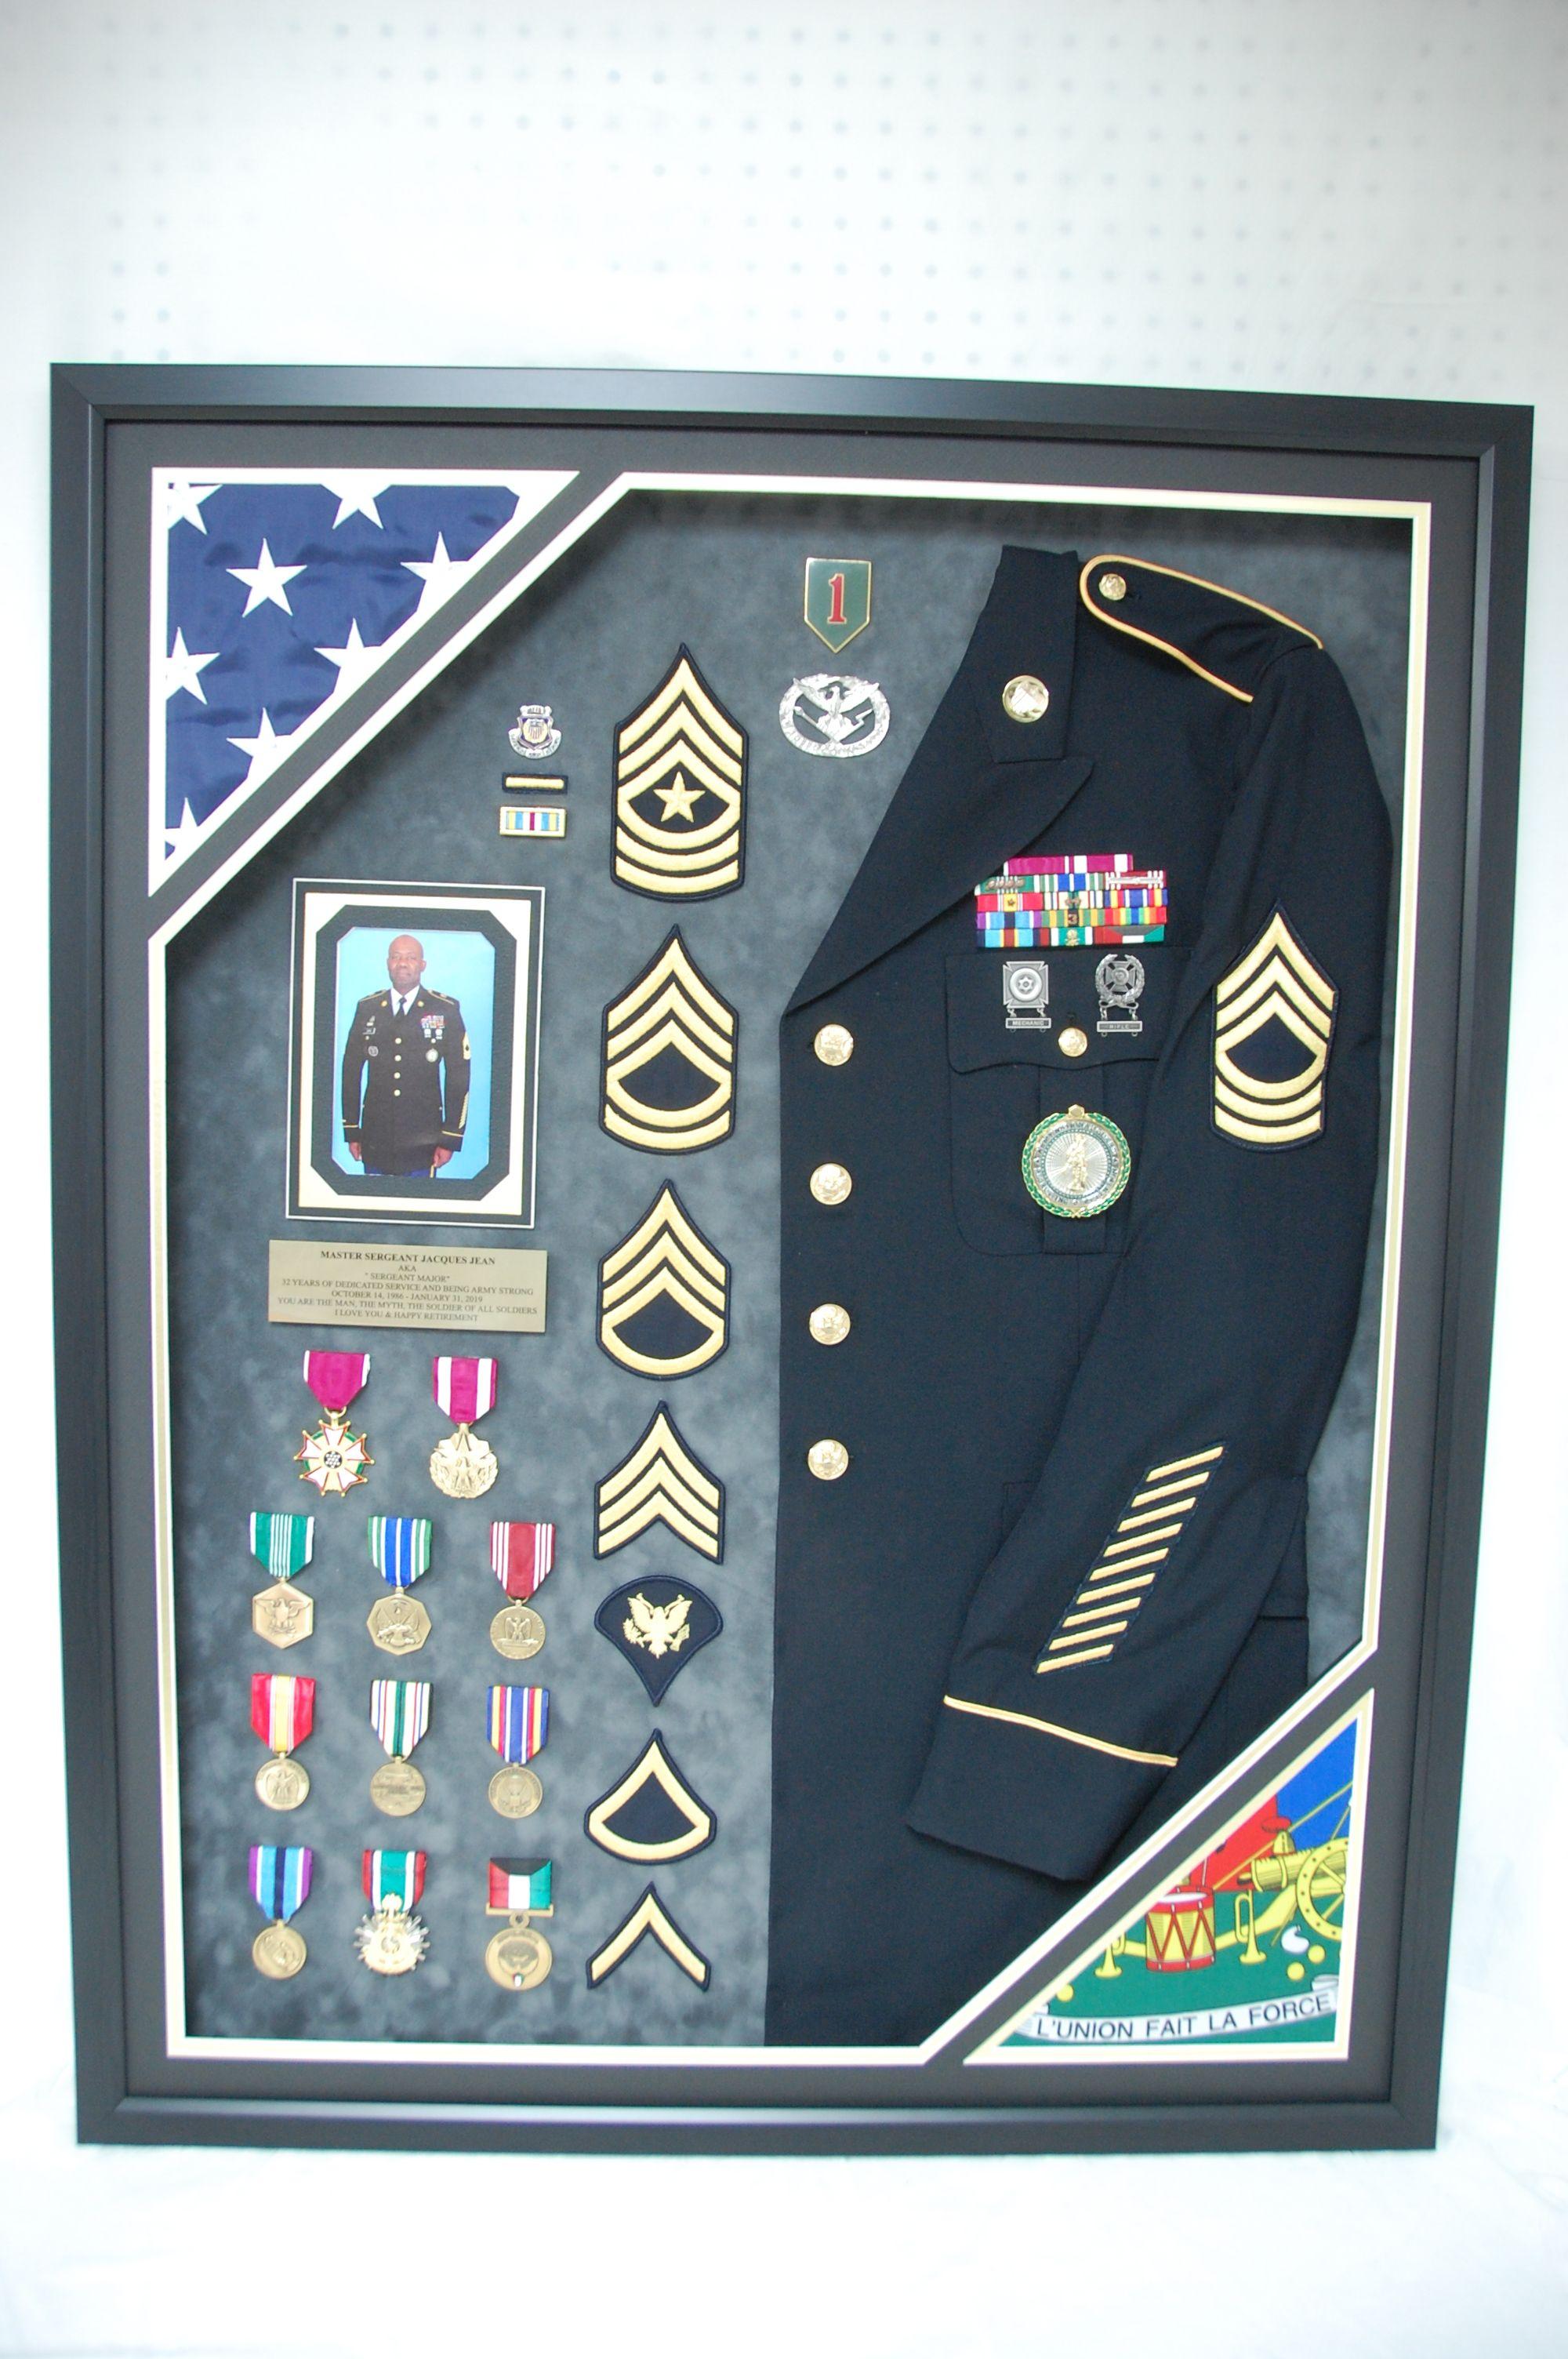 30 X 38 Double Flag Uniform Shadow Box In 2021 Military Shadow Box Military Shadow Box Ideas Shadow Box